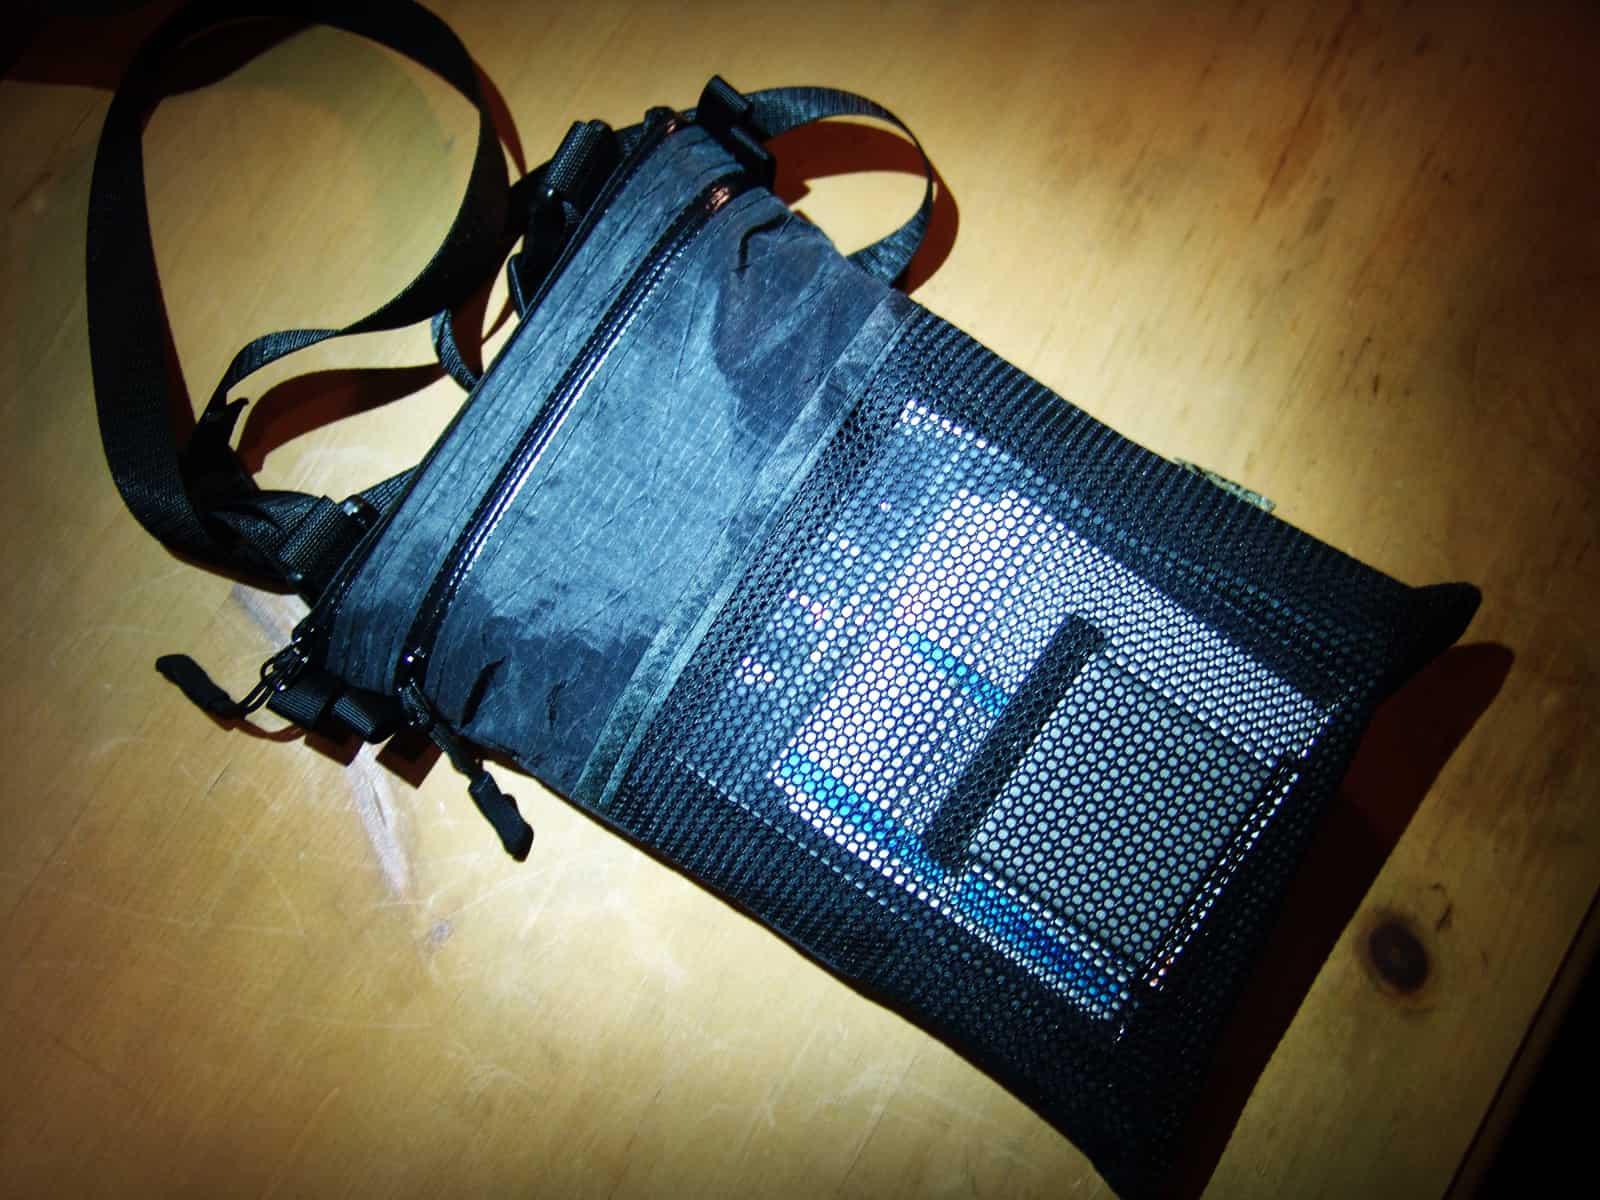 Minimalist Woodland Recon Kit pc12